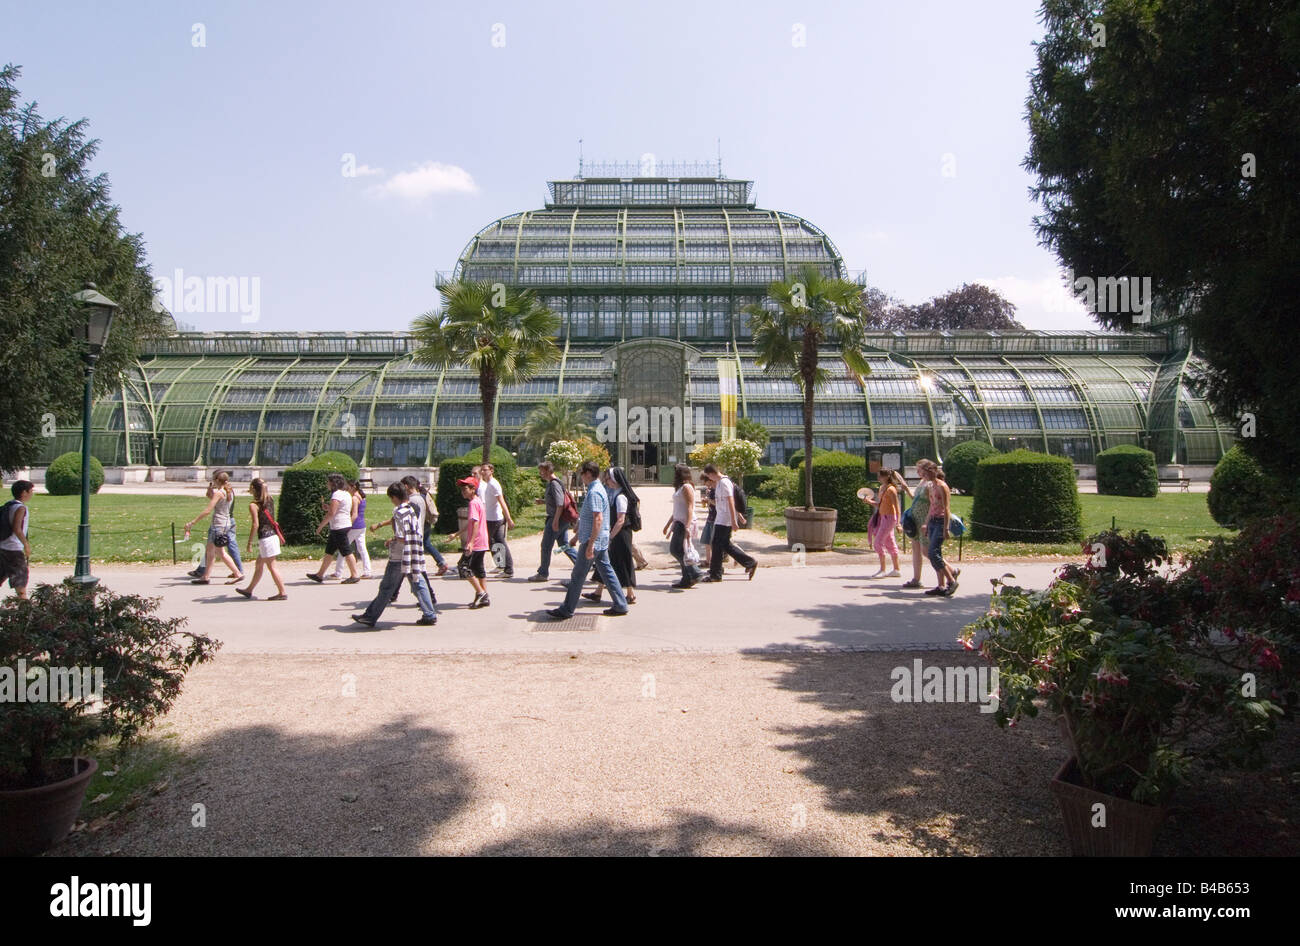 Palm house at Park Schloss Schönbrunn in Vienna Austria - Stock Image